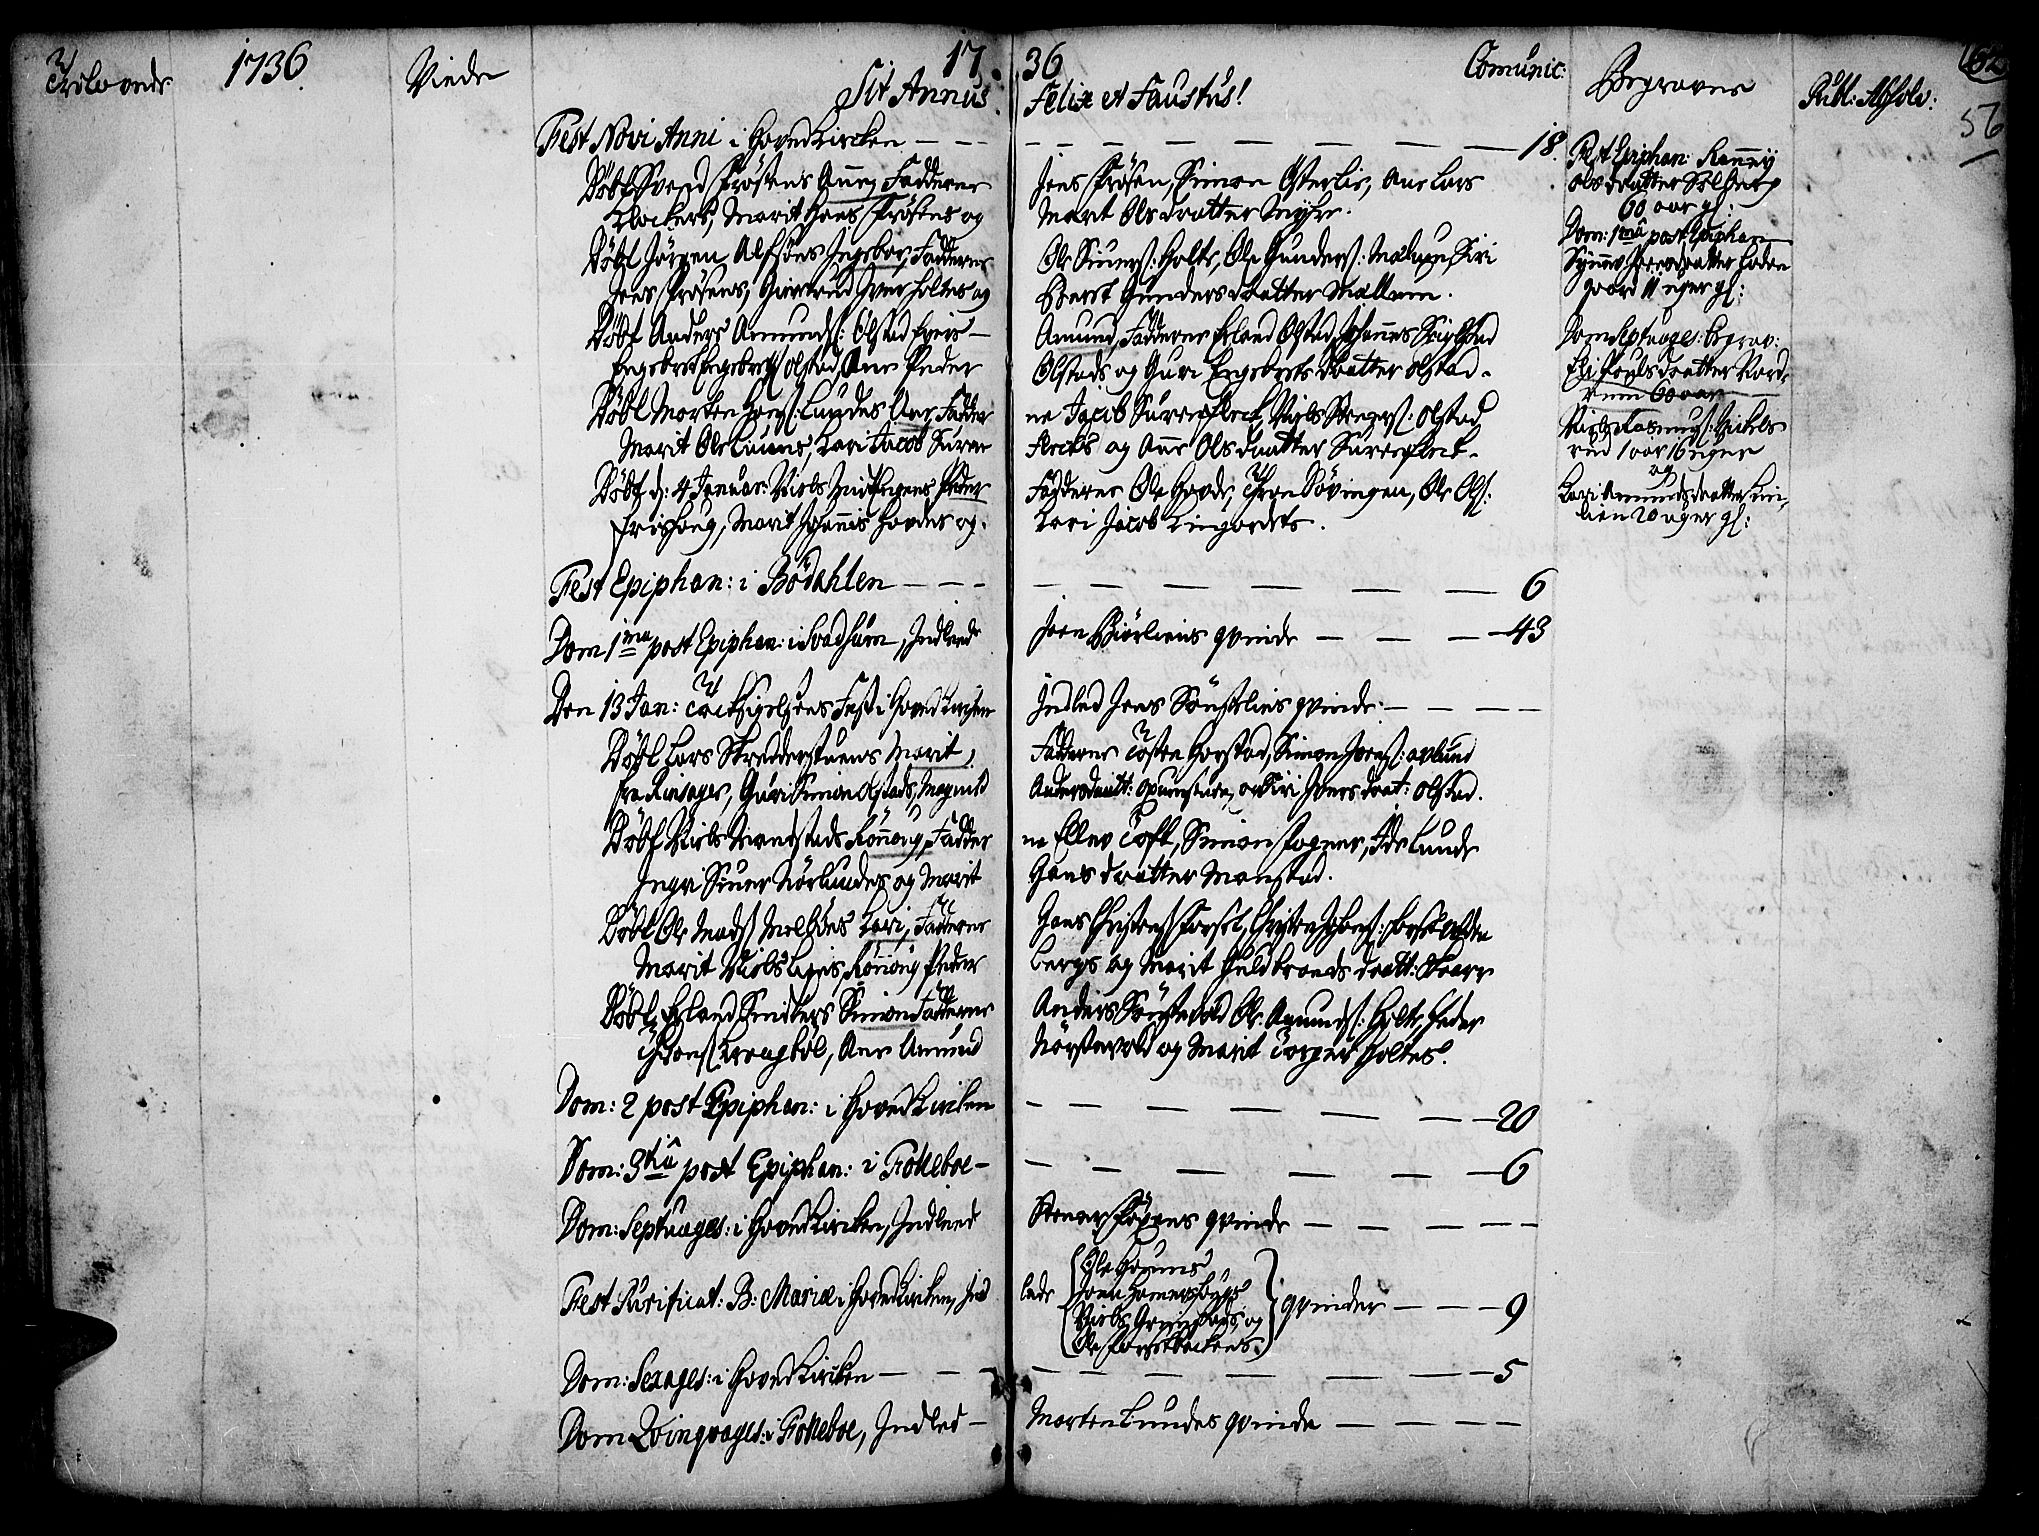 SAH, Gausdal prestekontor, Ministerialbok nr. 2, 1729-1757, s. 56